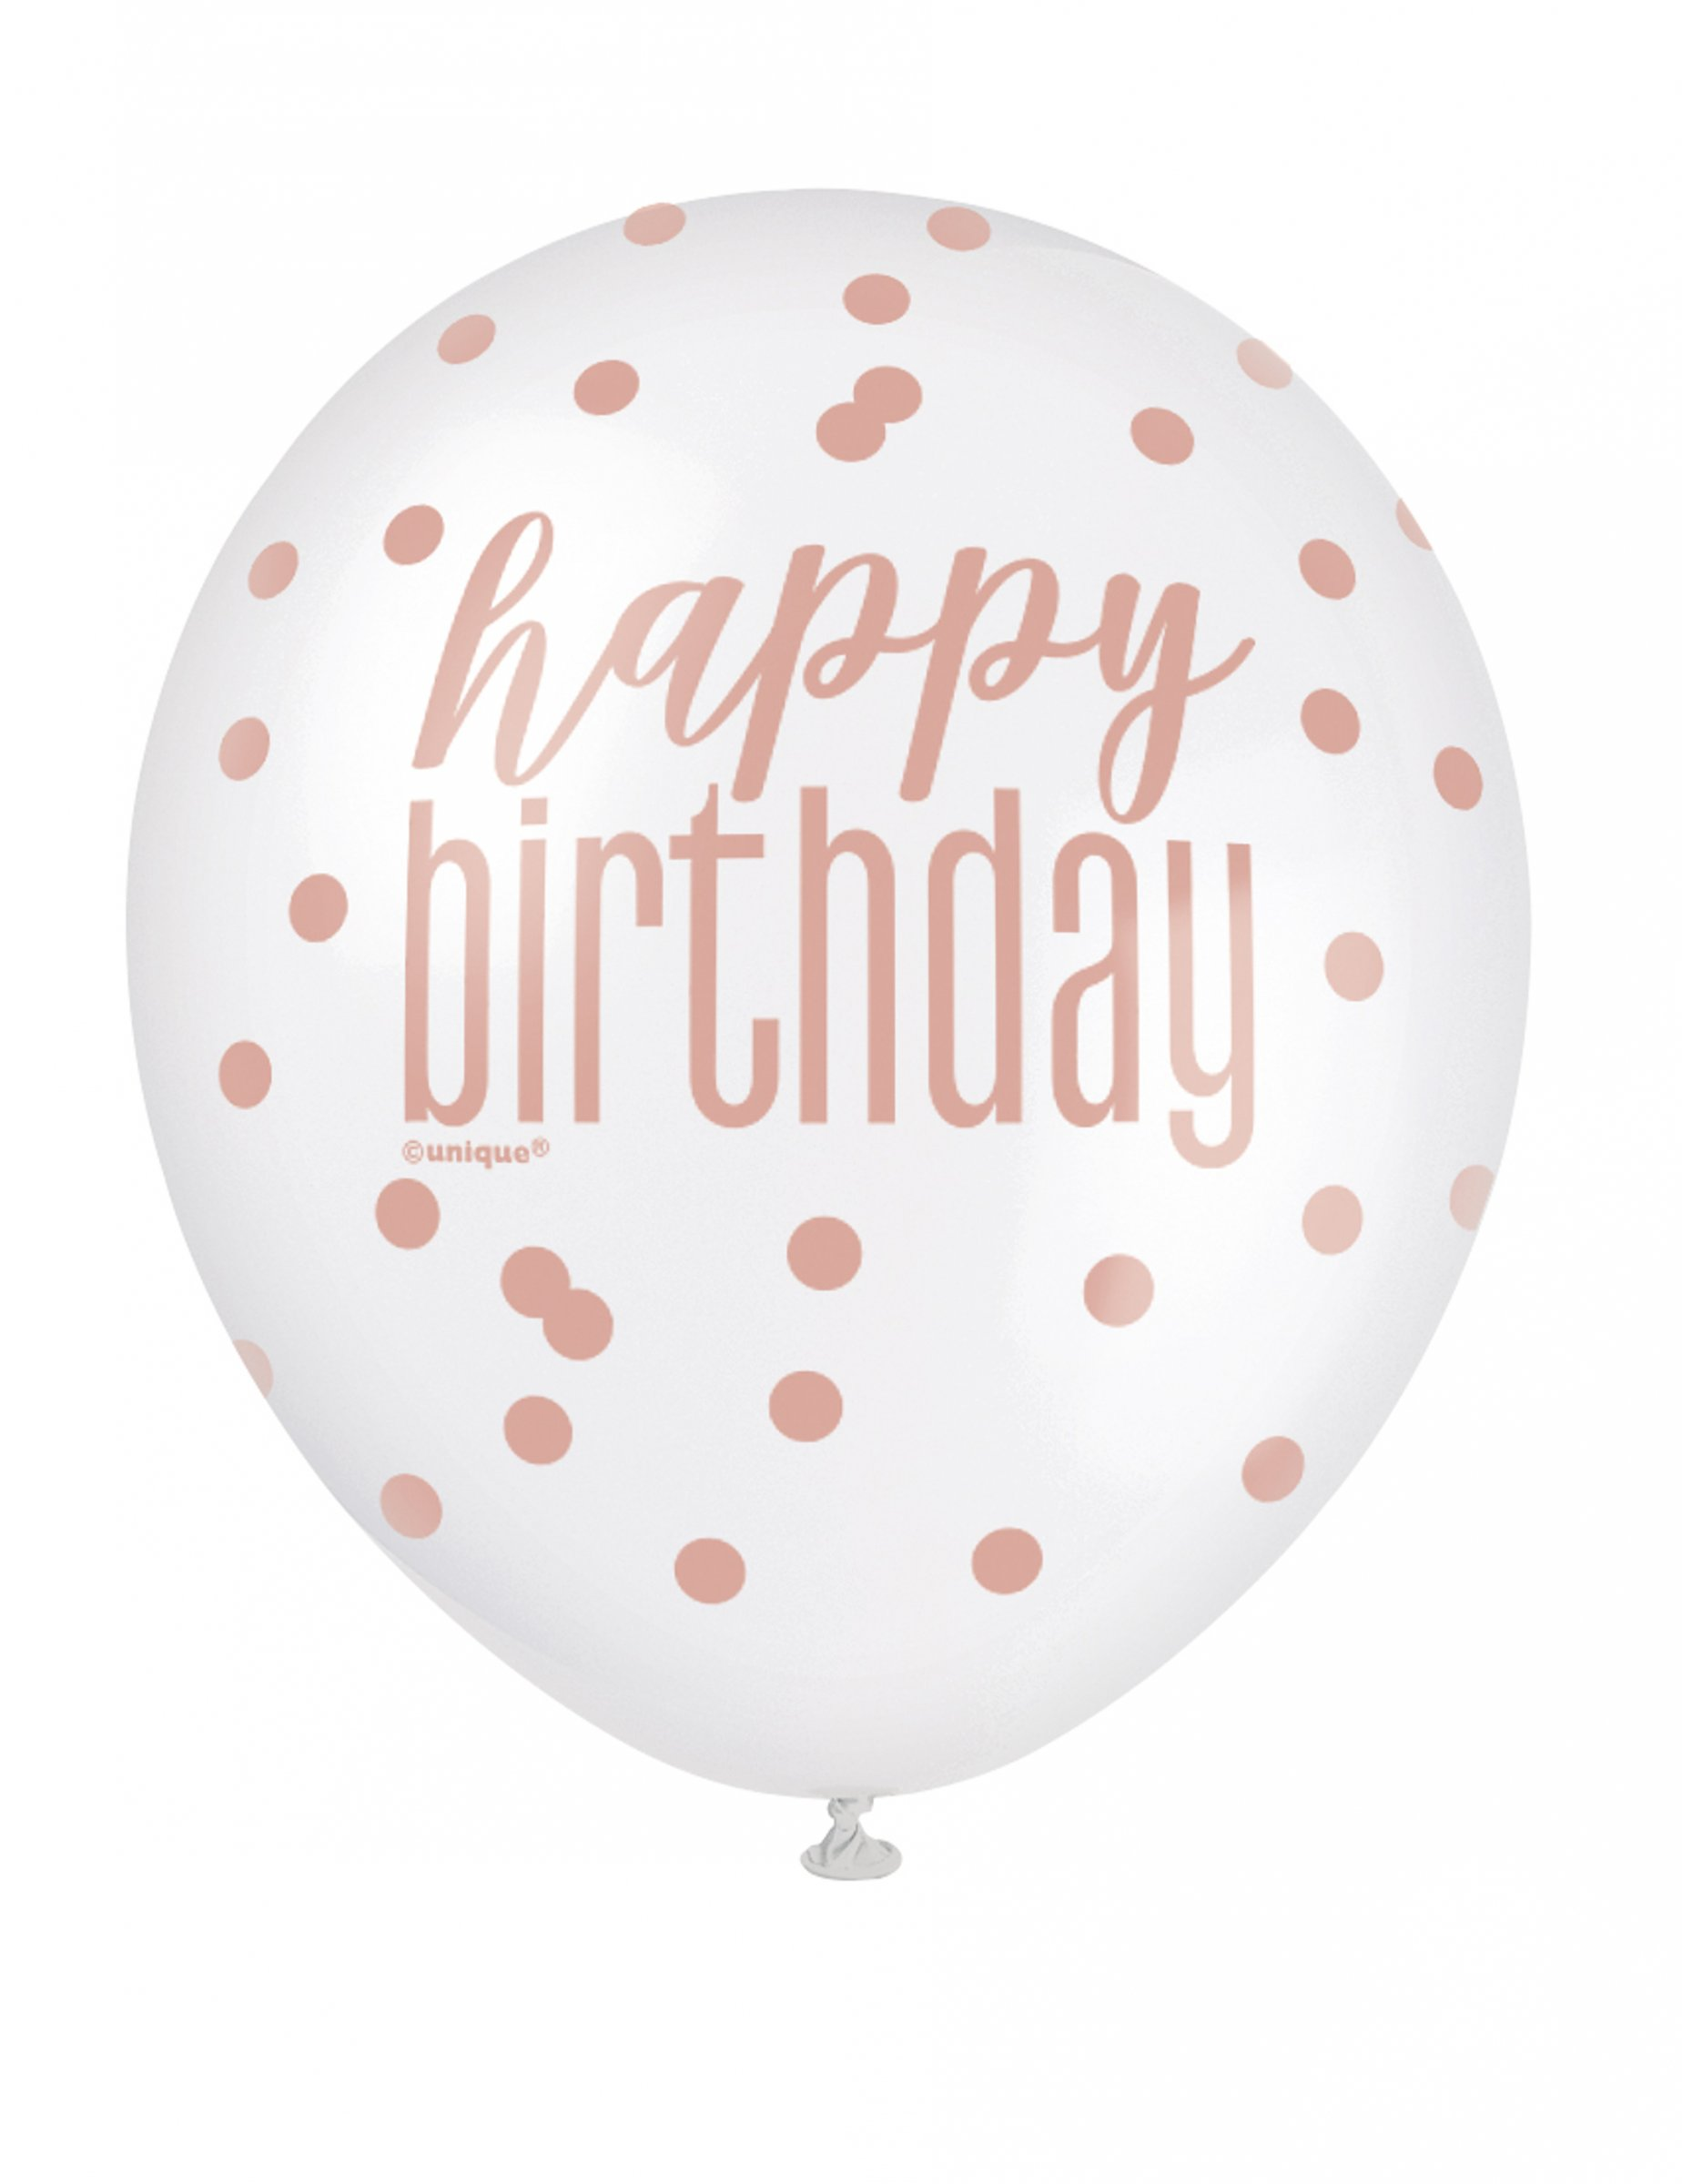 13+ Geburtstag Ballon Luftballon 8 Stück roségold weiß 8 cm Kollektion